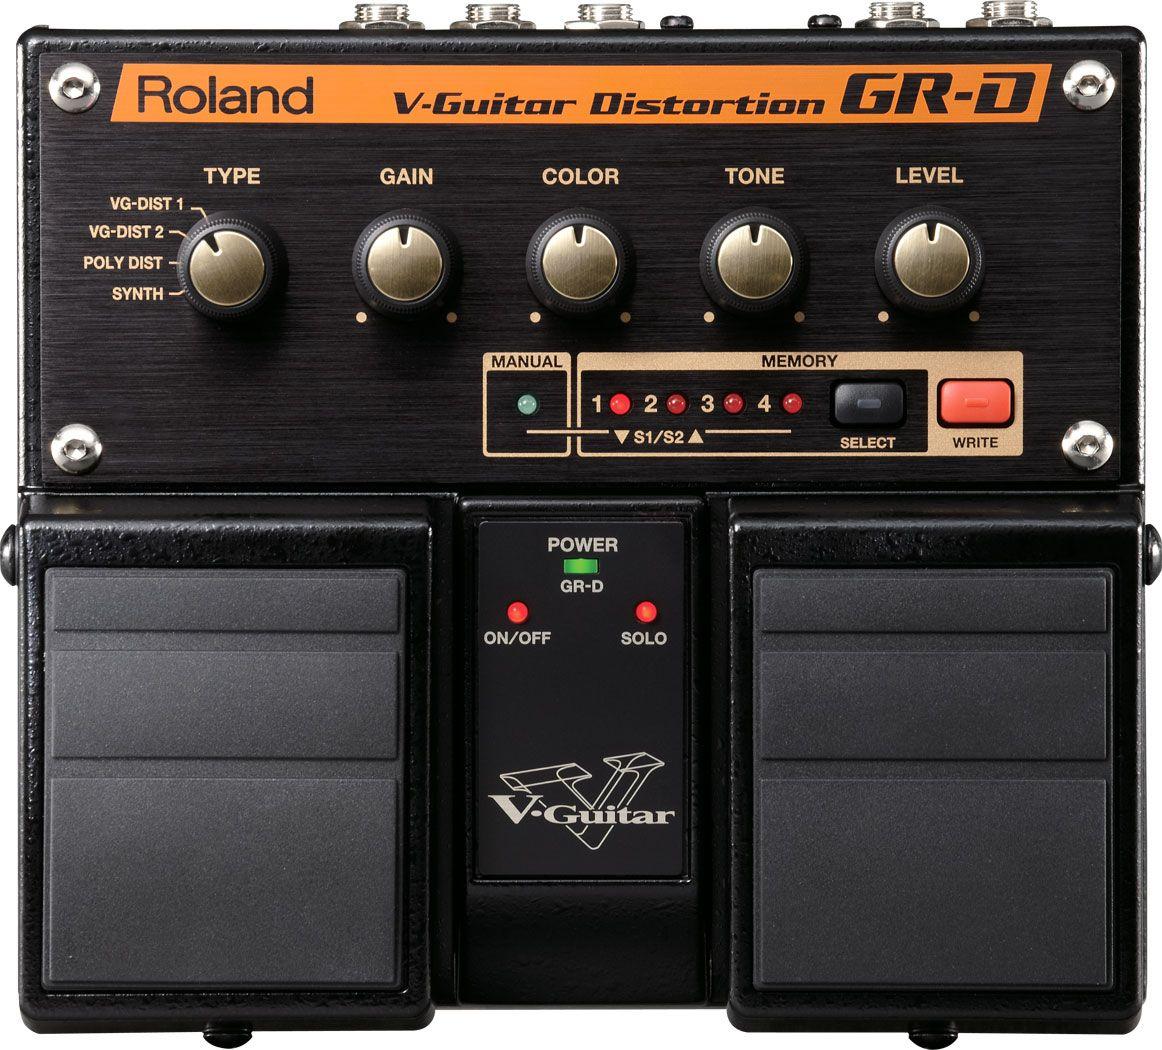 gr d v guitar distortion gk power in a twin pedal stompbox guitar gear guitar distortion. Black Bedroom Furniture Sets. Home Design Ideas